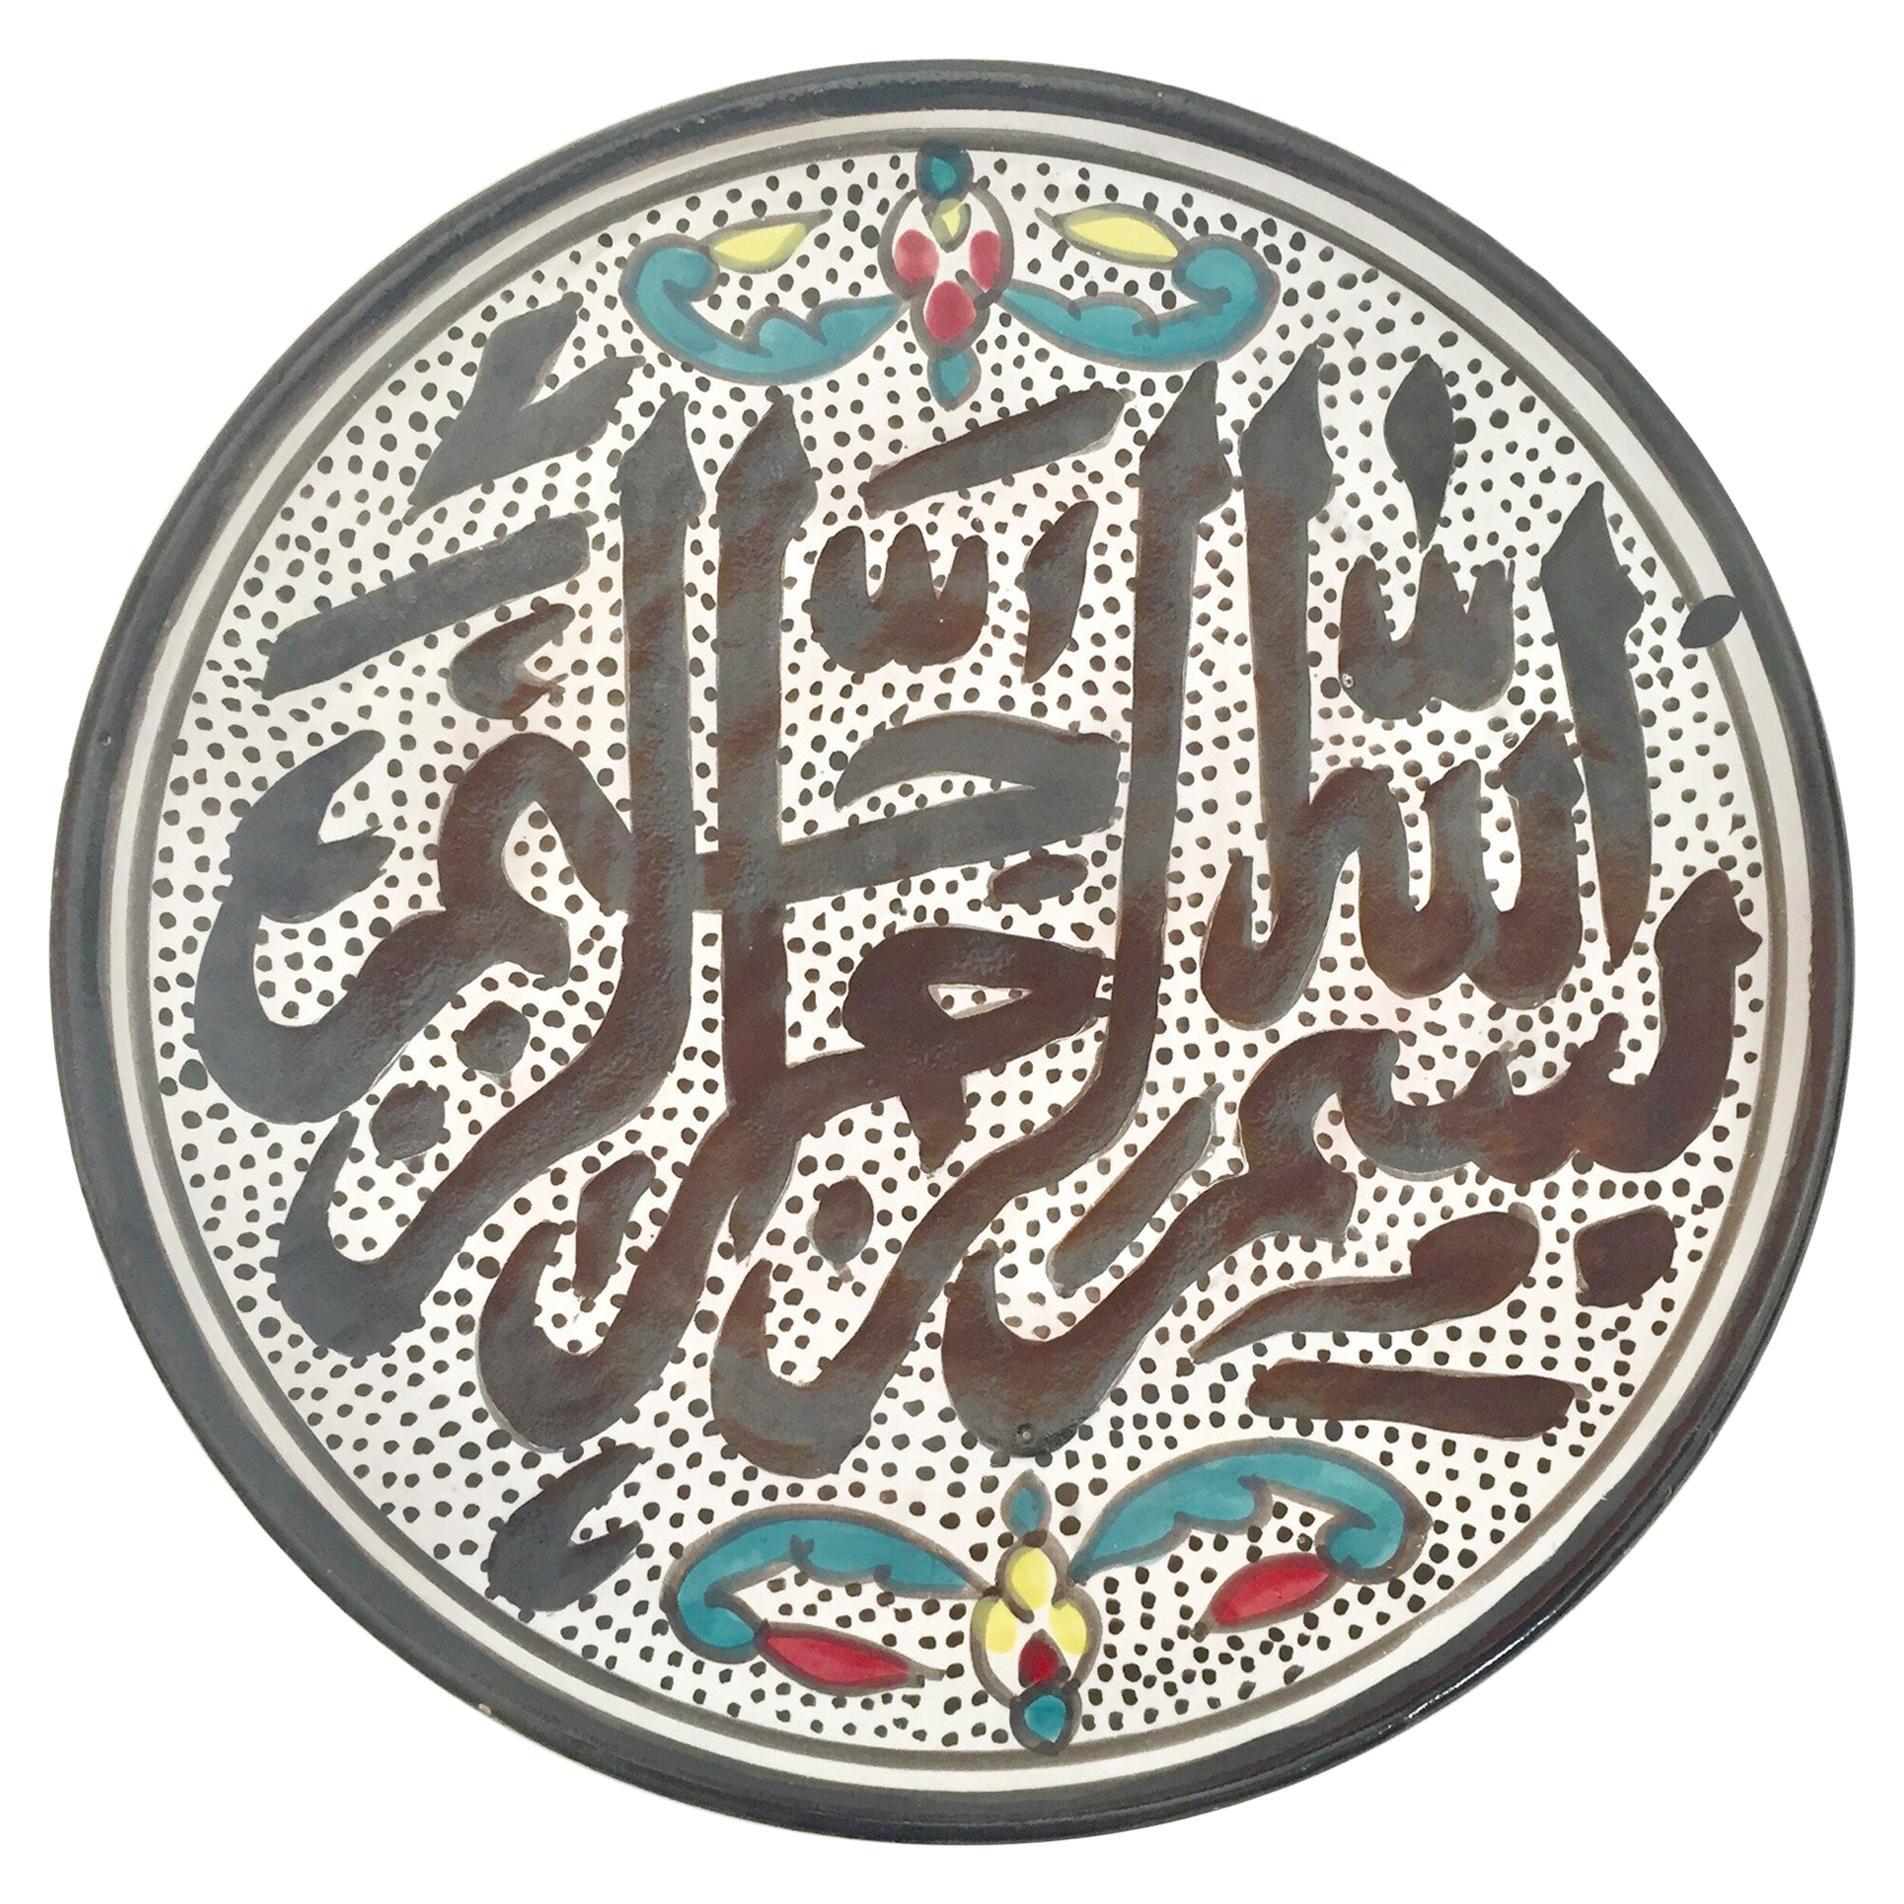 Polychrome Hand Painted Moorish Ceramic Decorative Islamic Plate